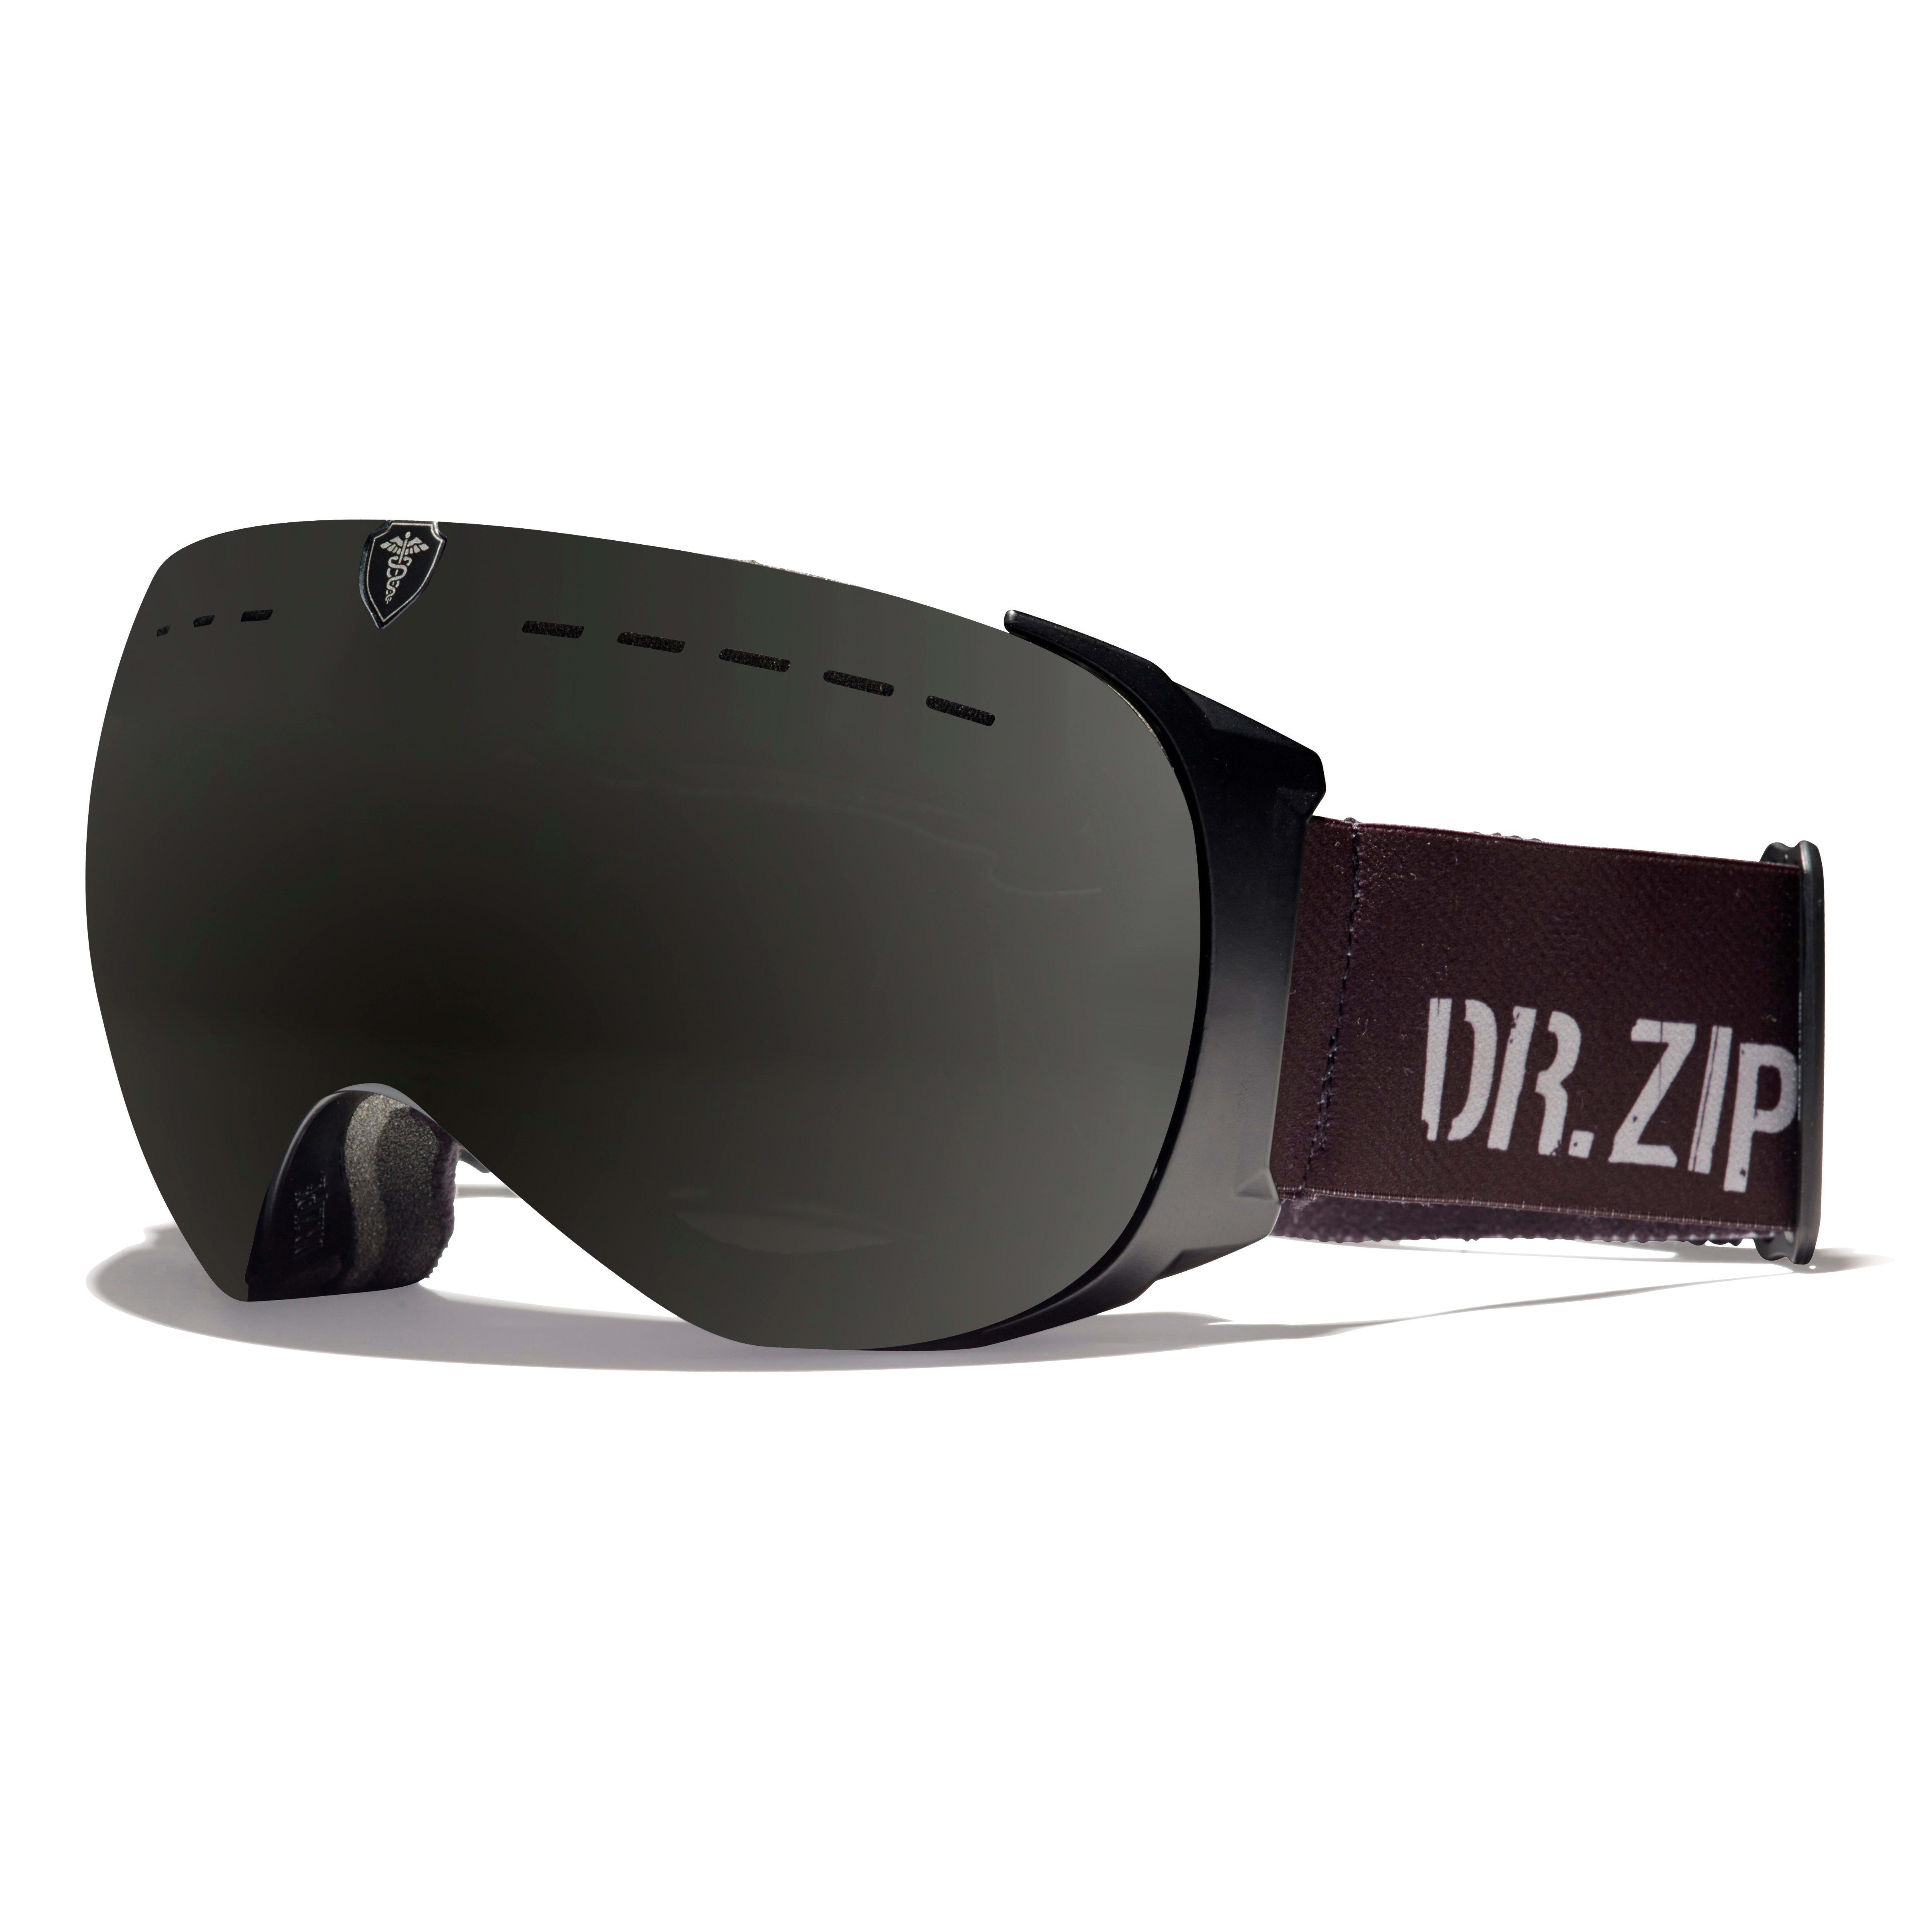 Dr Zipe Headmaster L Vii